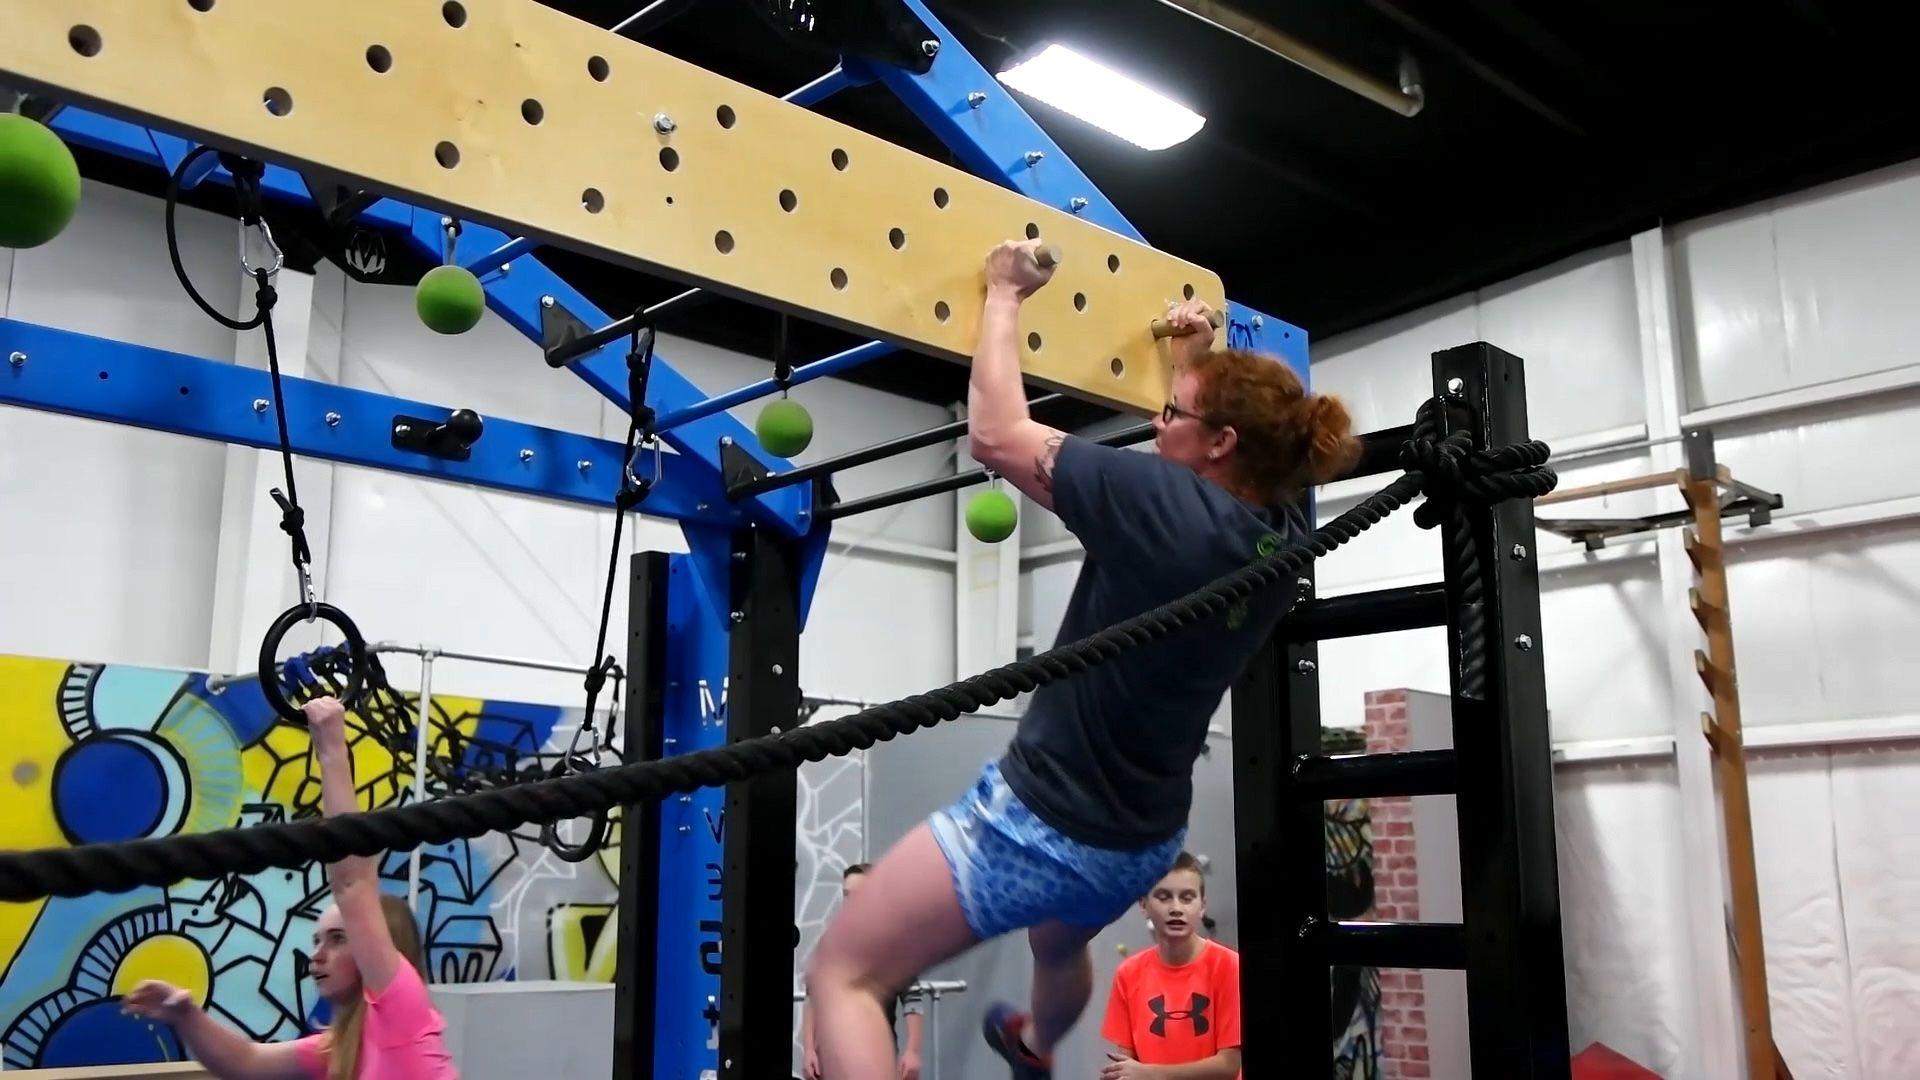 Peg Board Feature Offered On The Movestrong Nova Fts Models Home Gym Design Gym Design Ninja Warrior Course